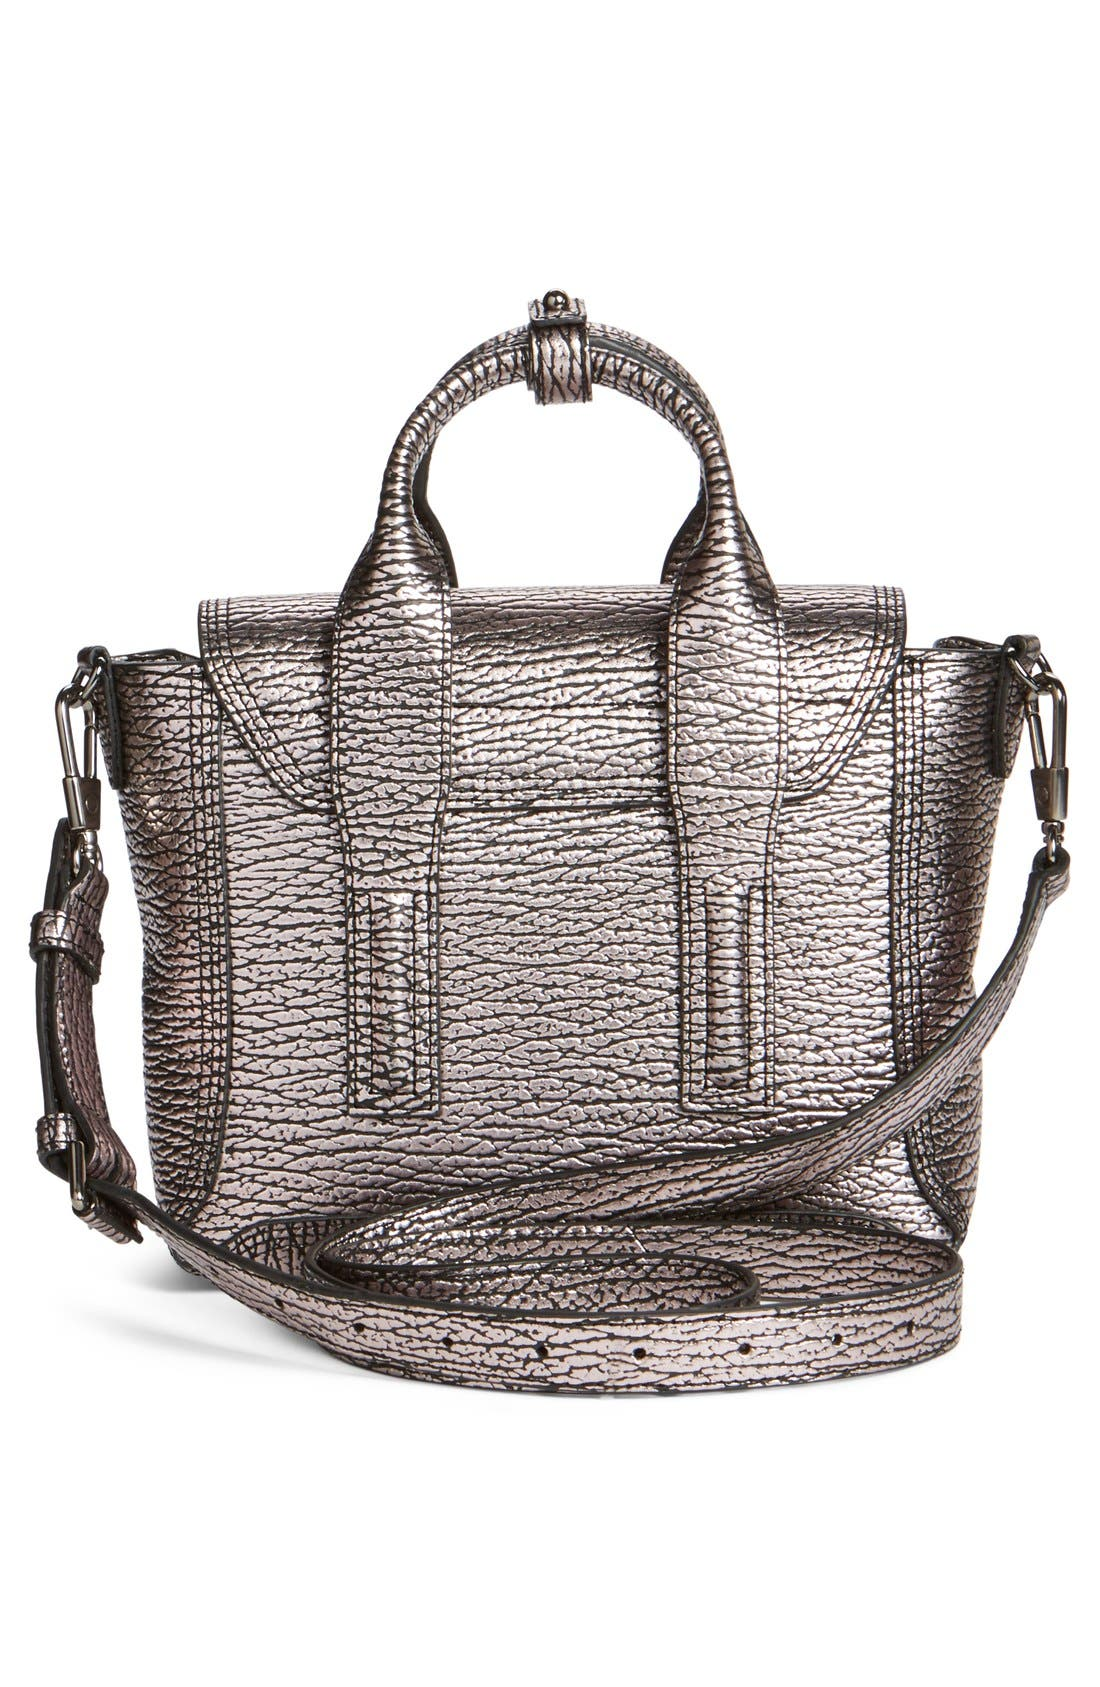 Alternate Image 2  - 3.1 Phillip Lim 'Mini Pashli' Metallic Leather Satchel